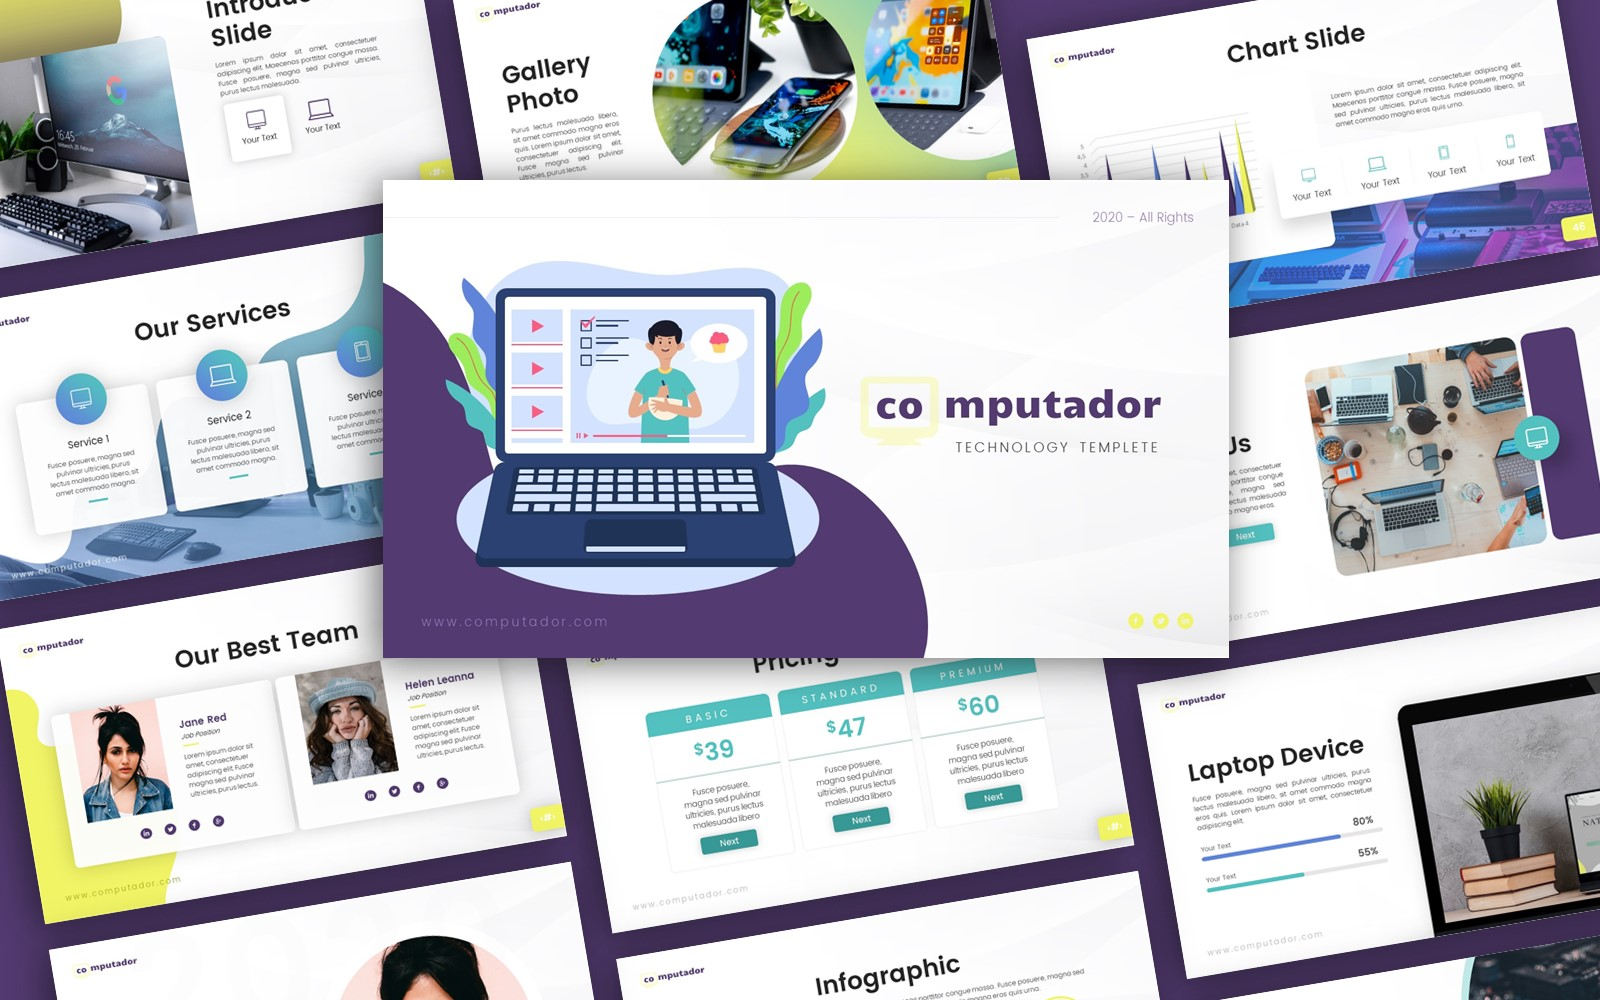 Computador Technology Presentation Template PowerPoint №153529